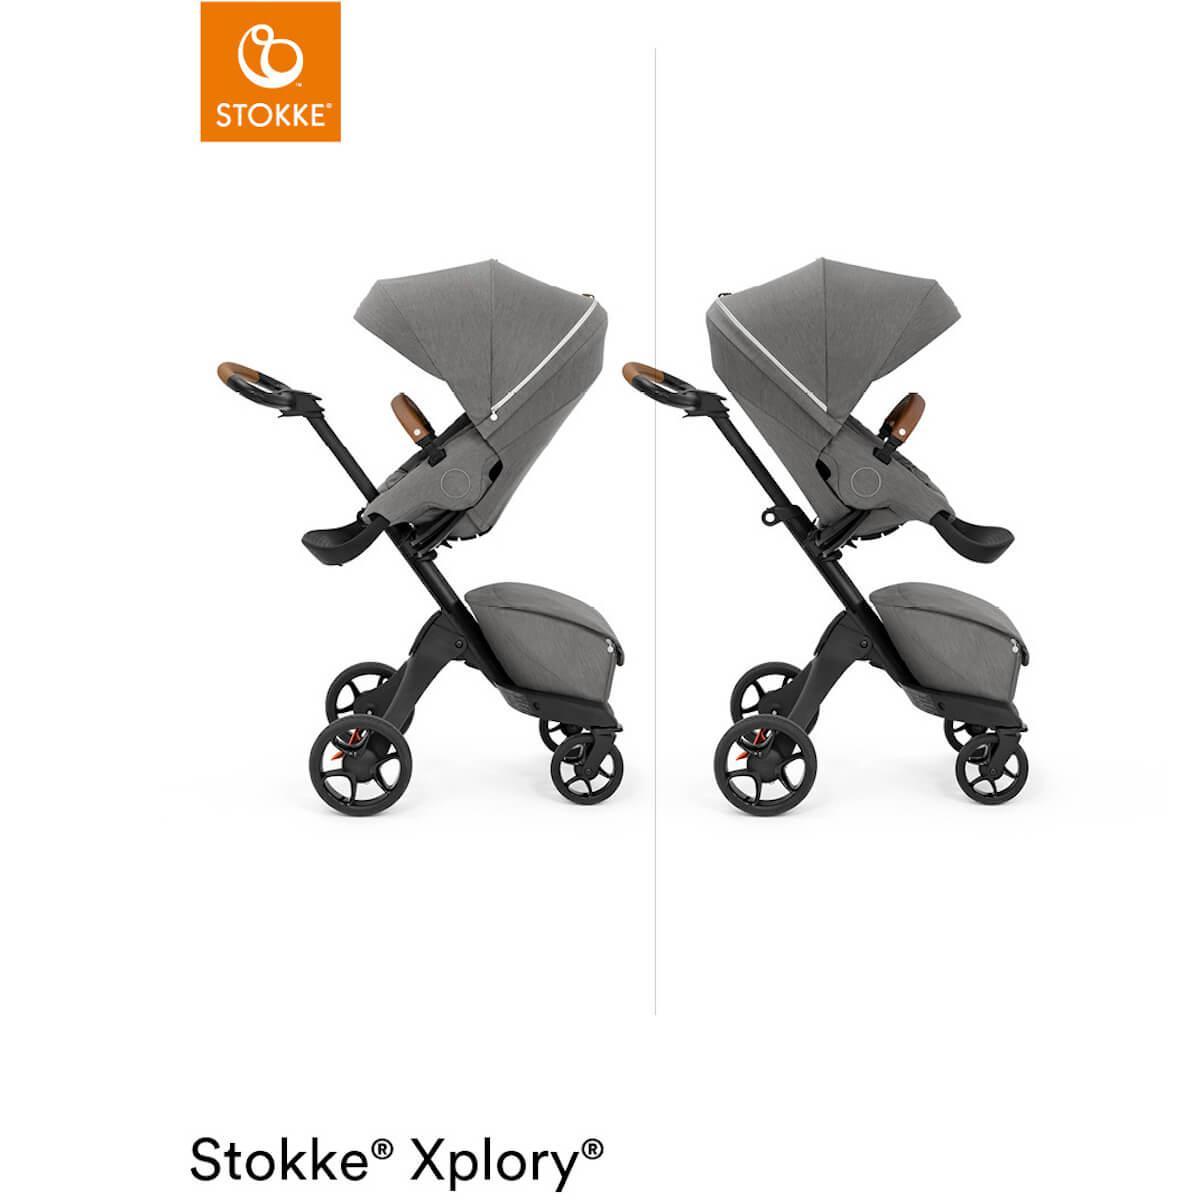 Kinderwagen XPLORY X Stokke Modern Grey